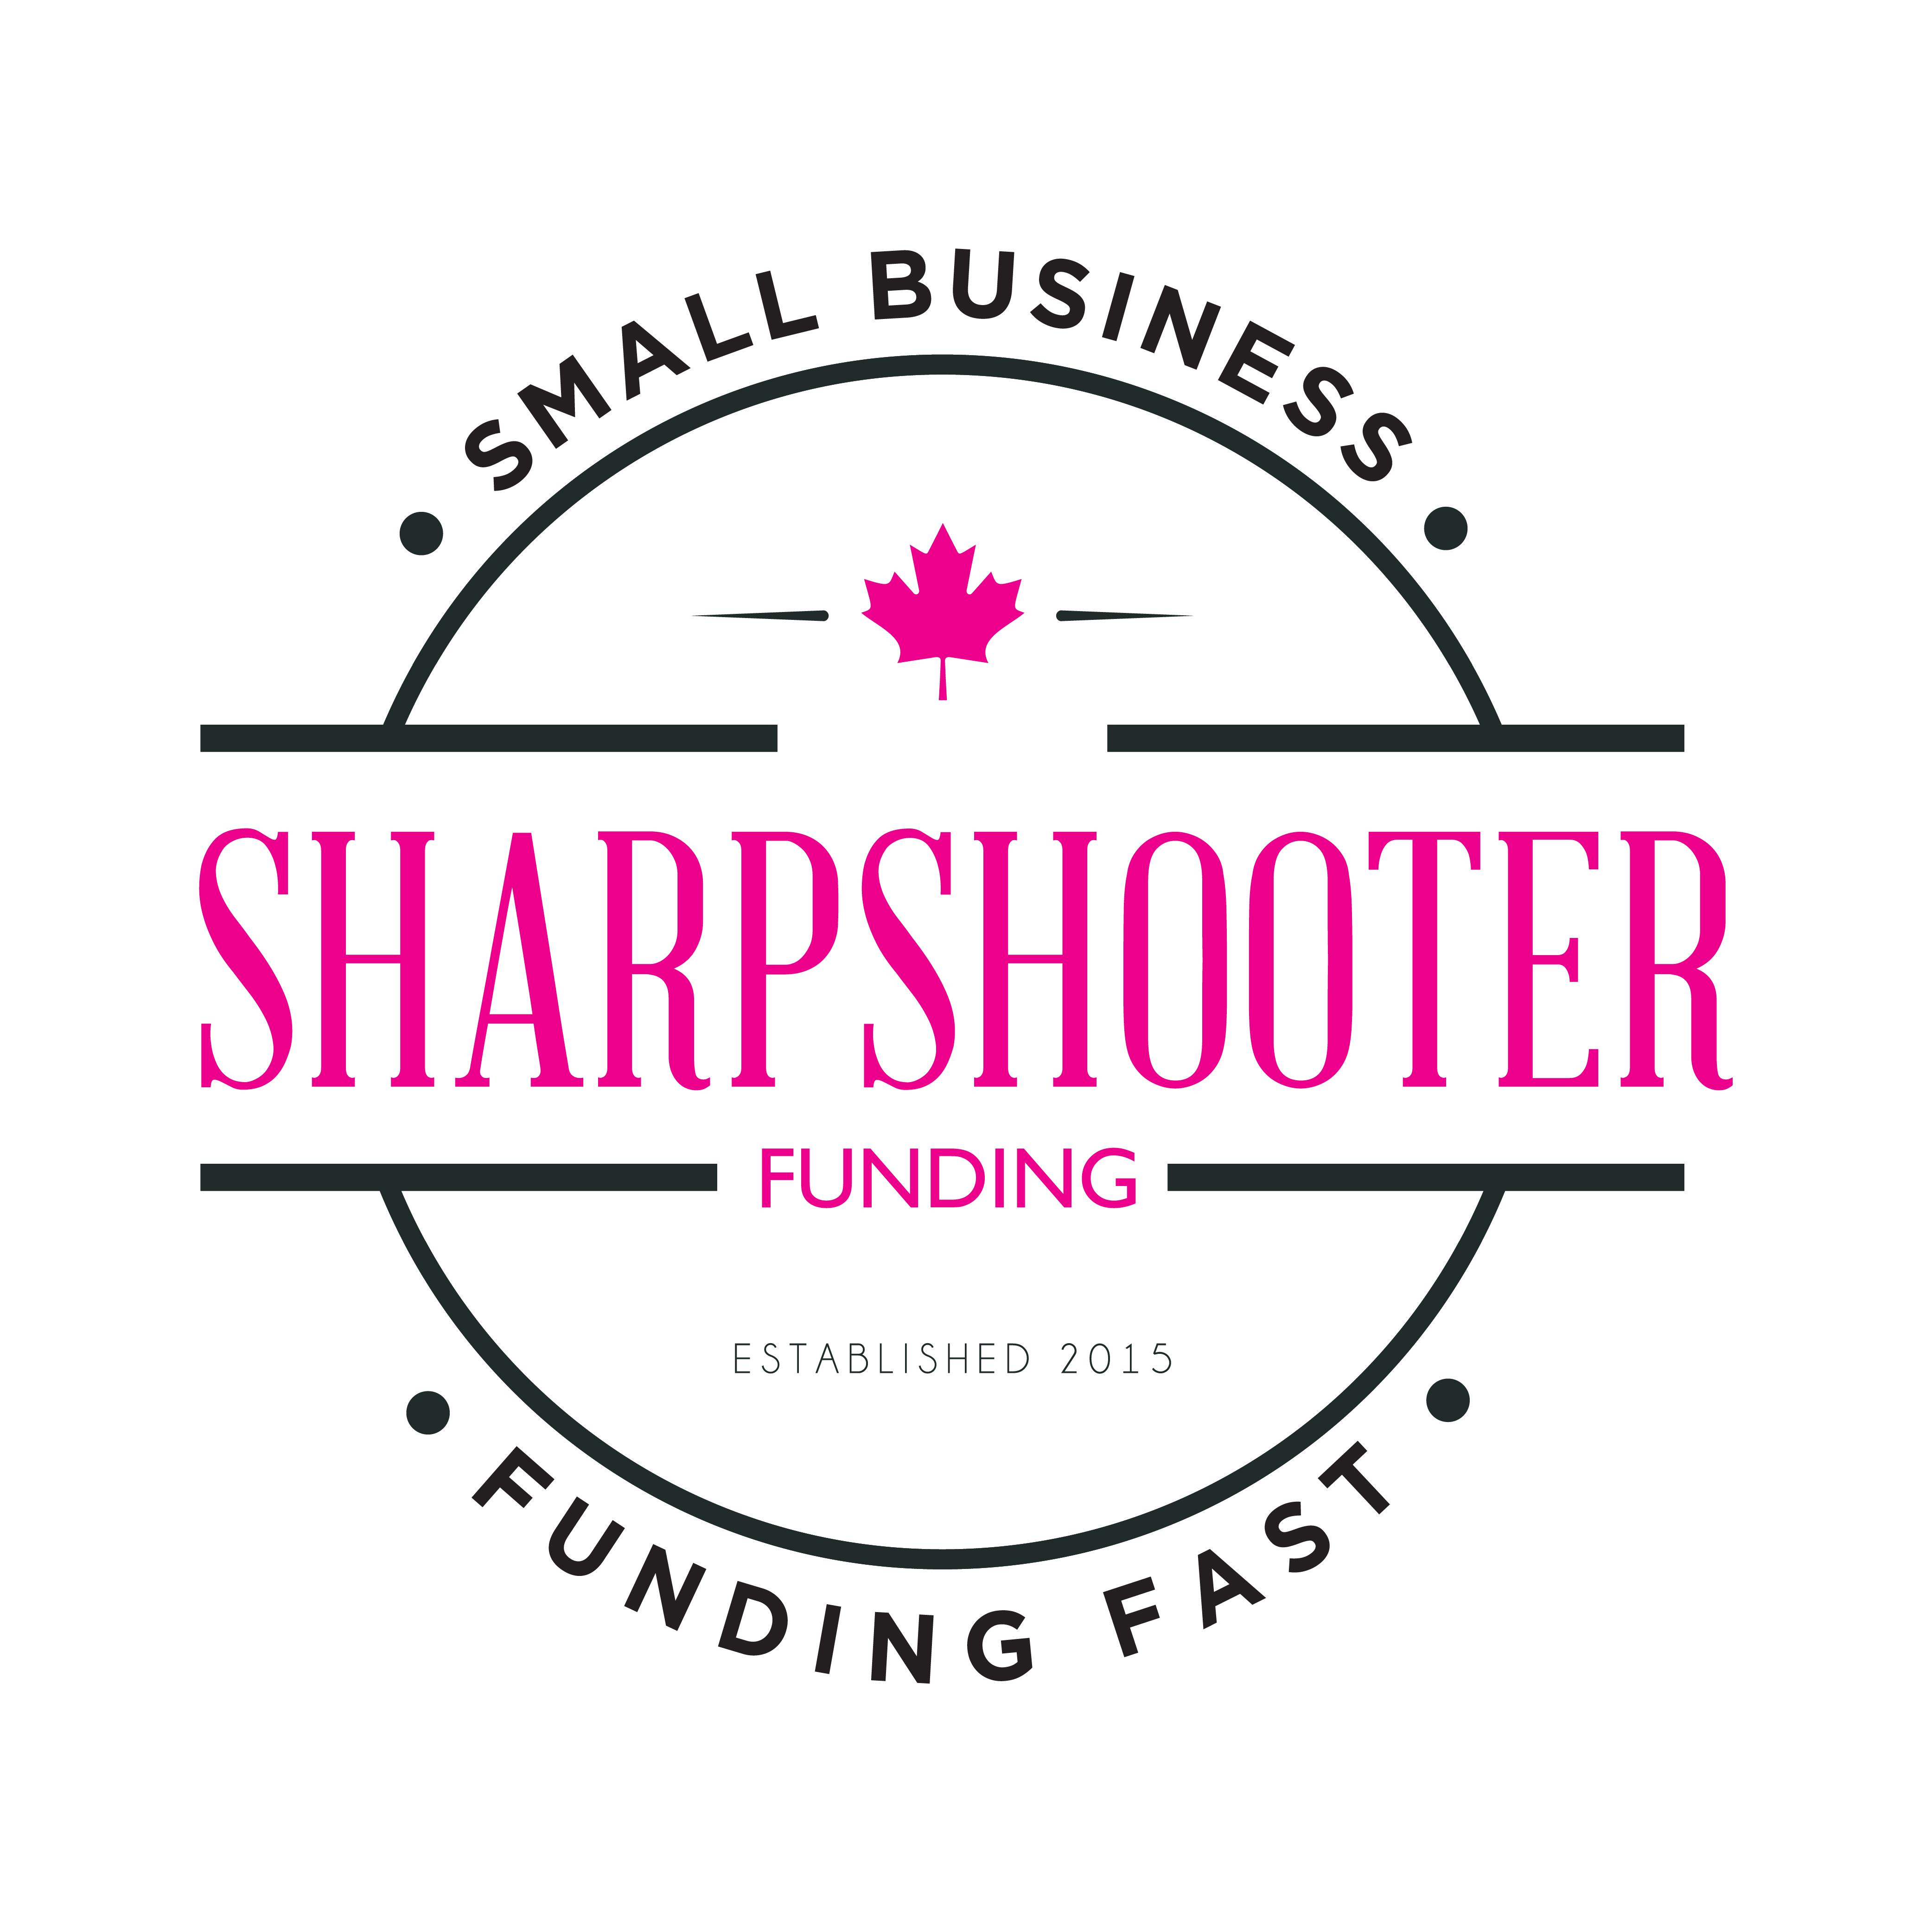 SharpShooter Funding